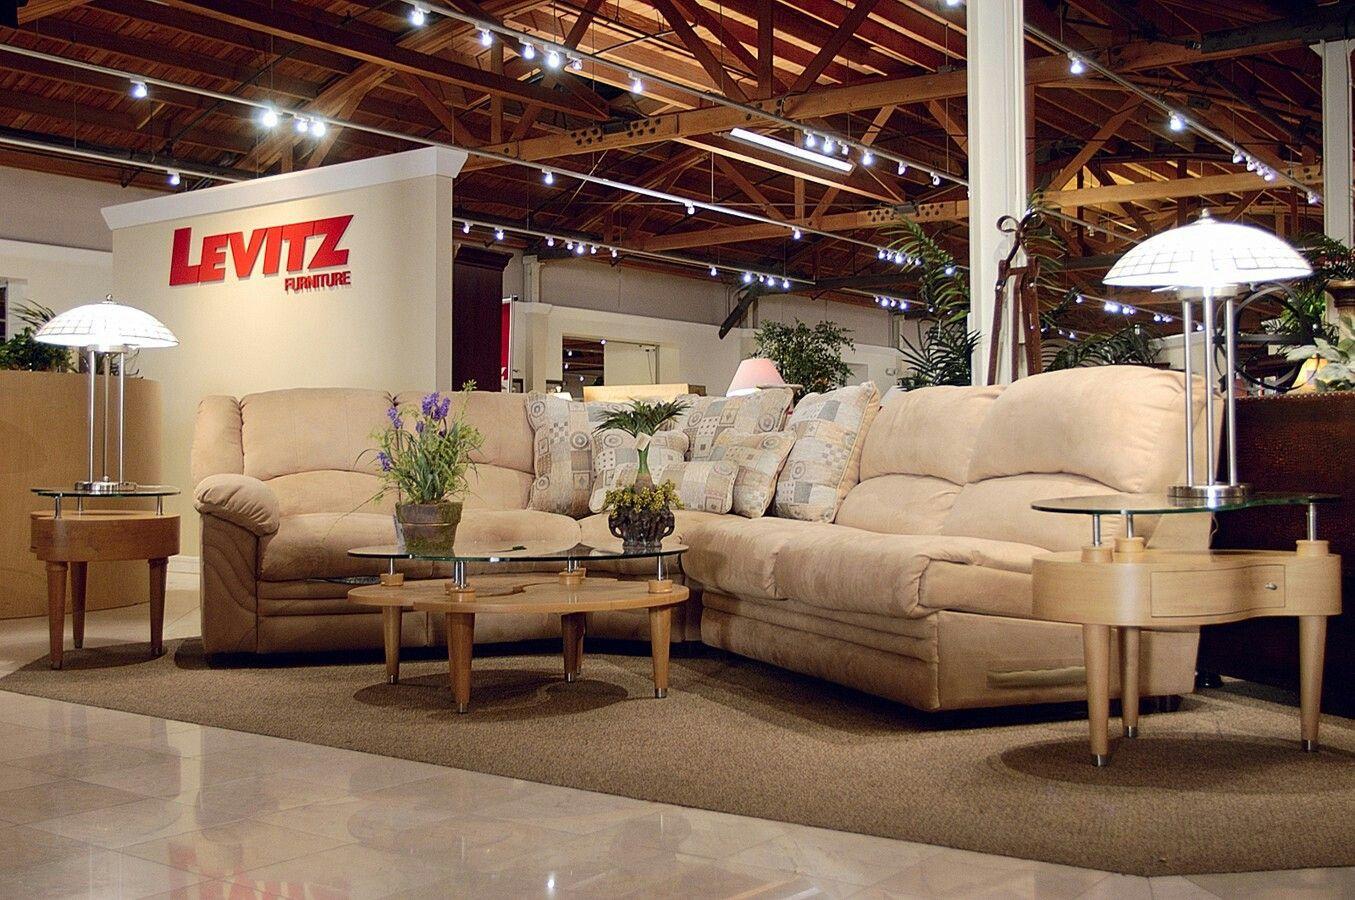 Inside levitz furniture